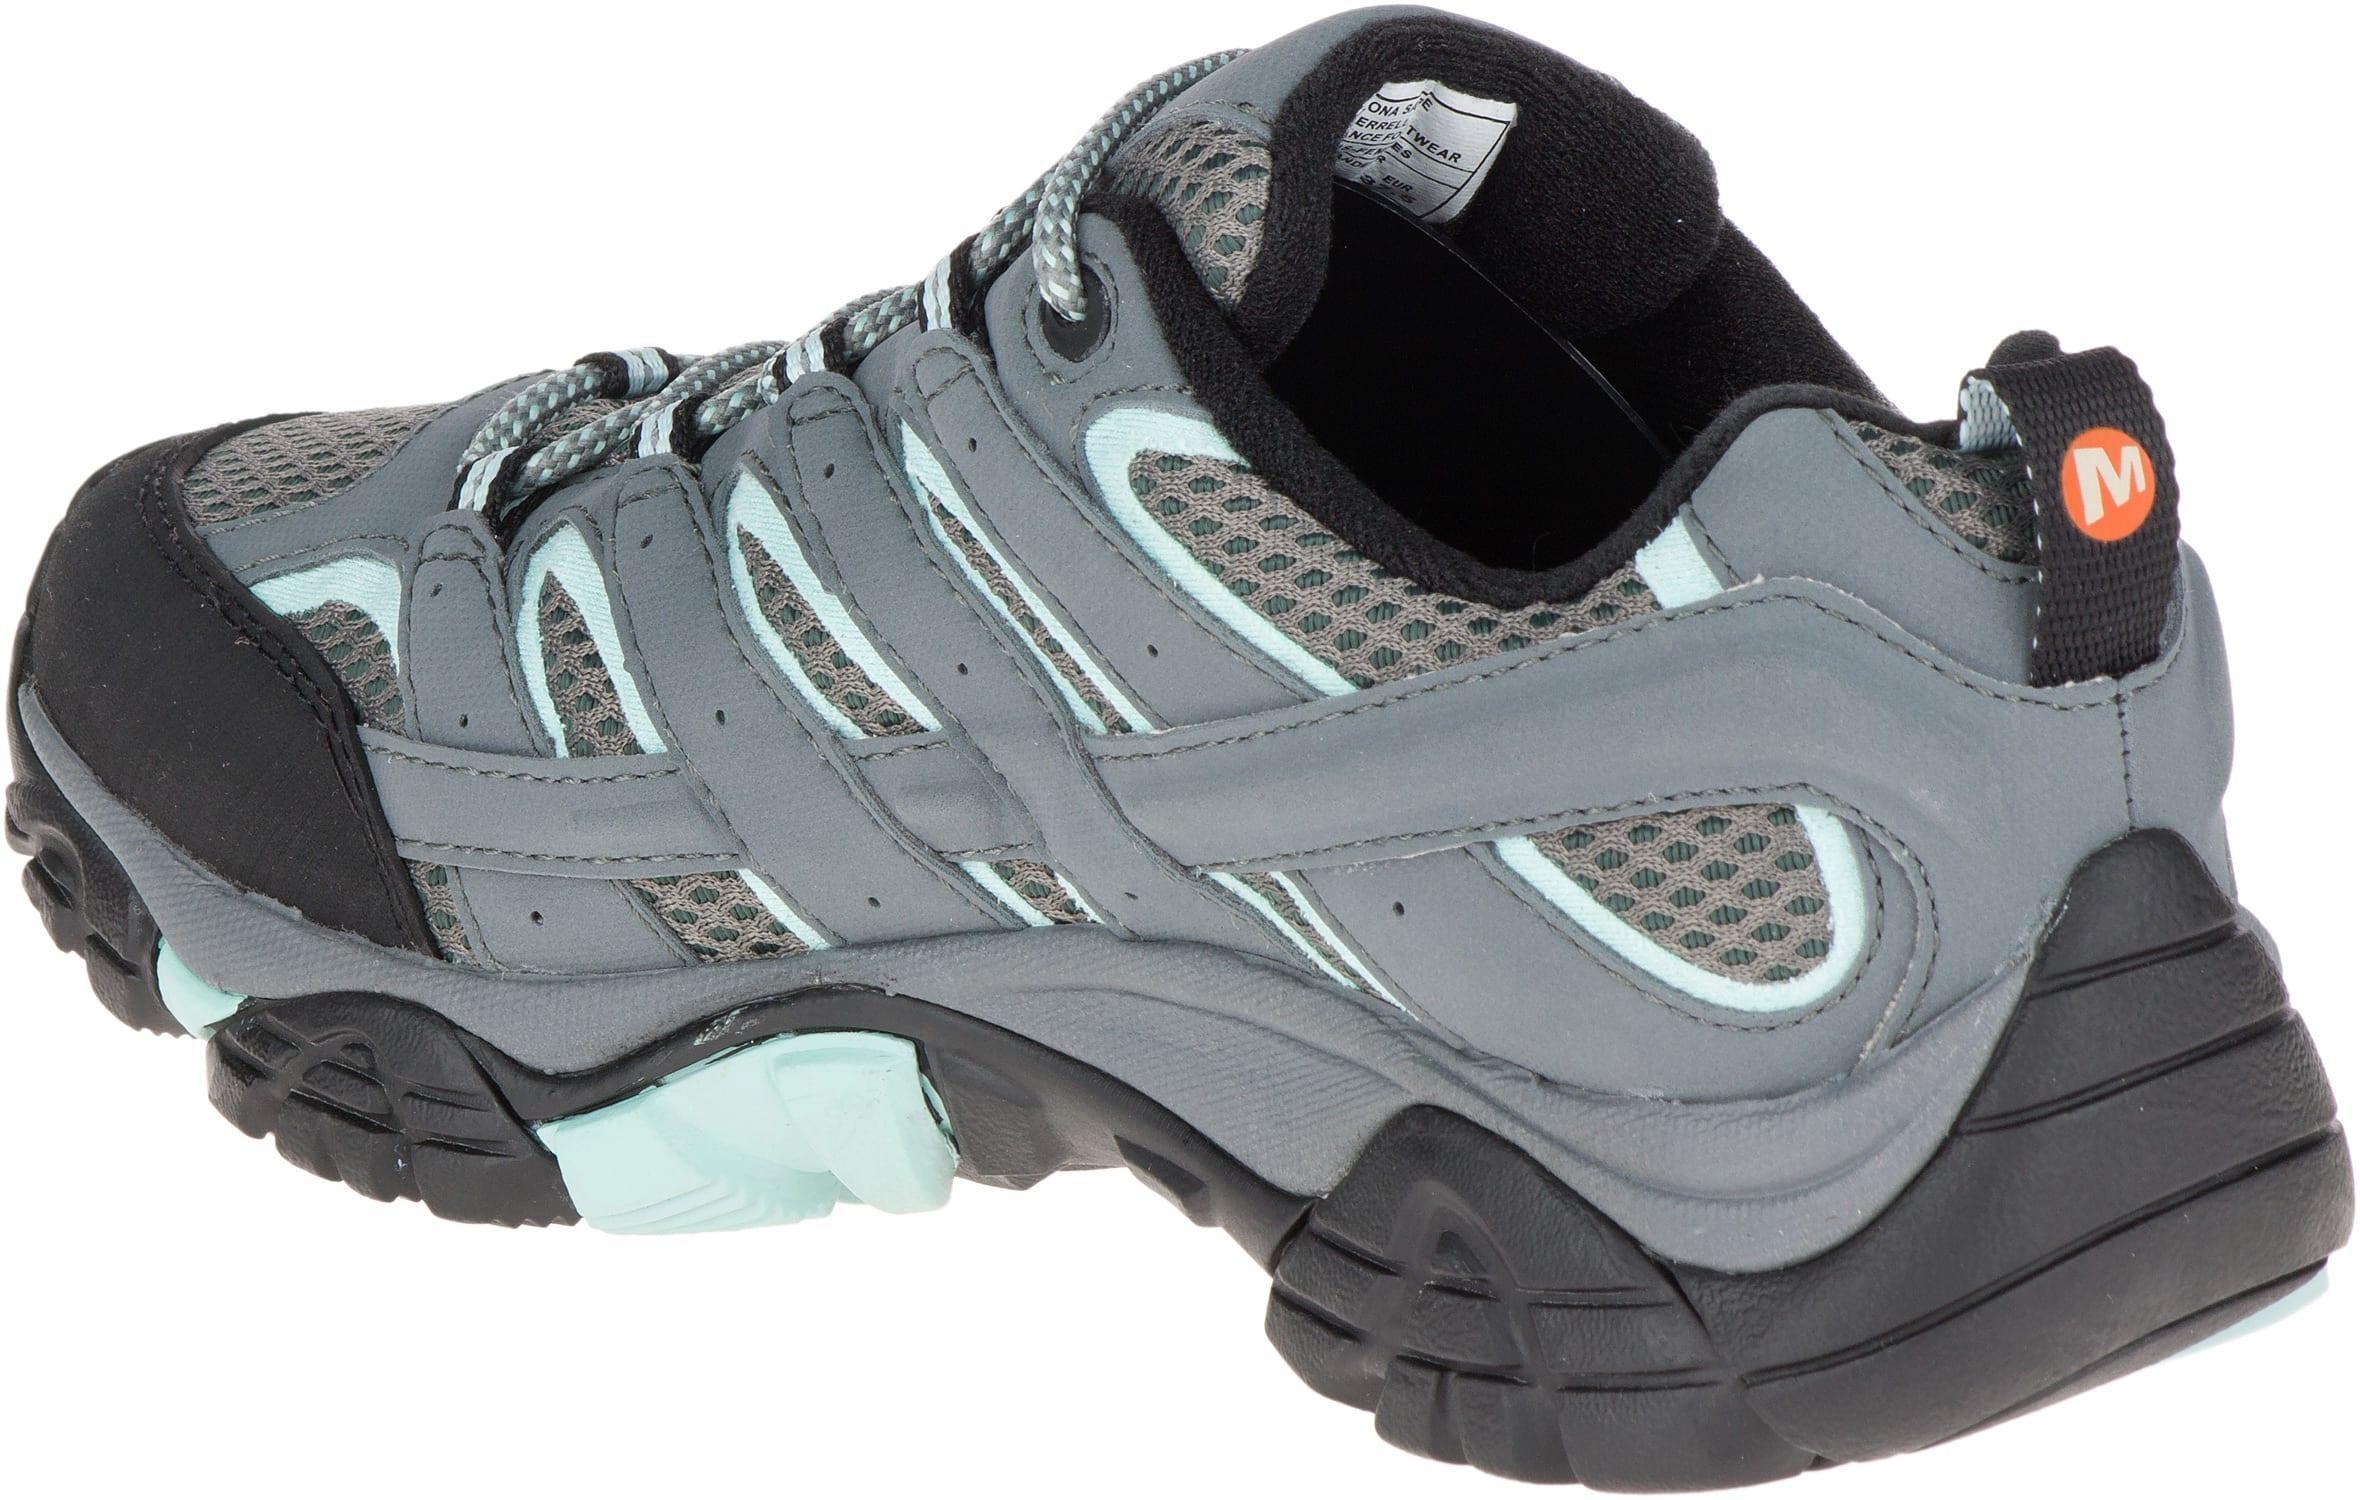 Merrell Moab 2 Gtx Hiking Shoes Womens